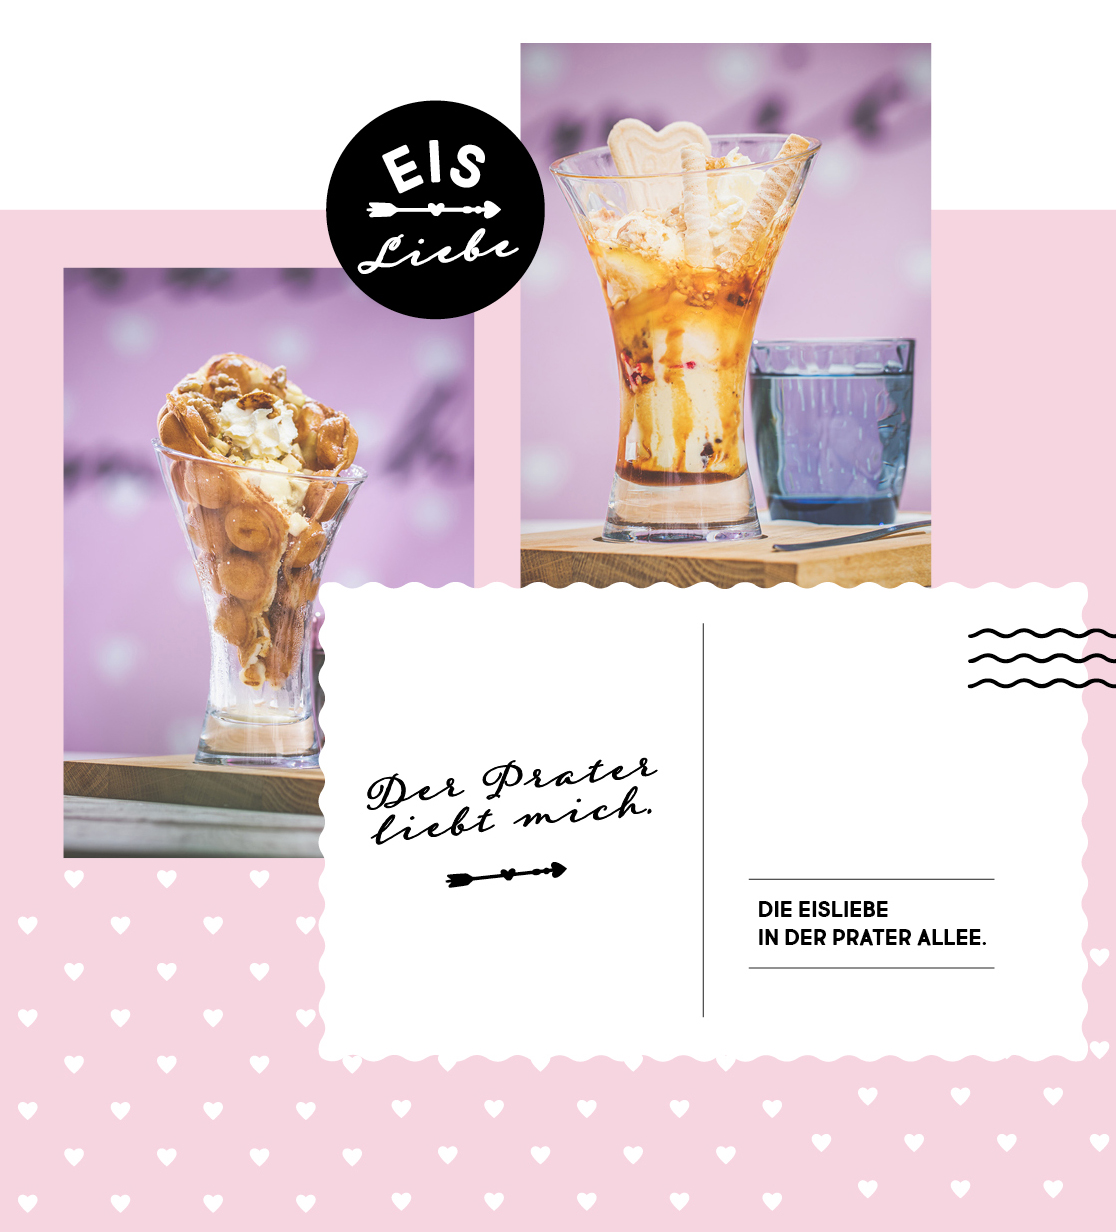 Die Eisliebe im Wiener Prater